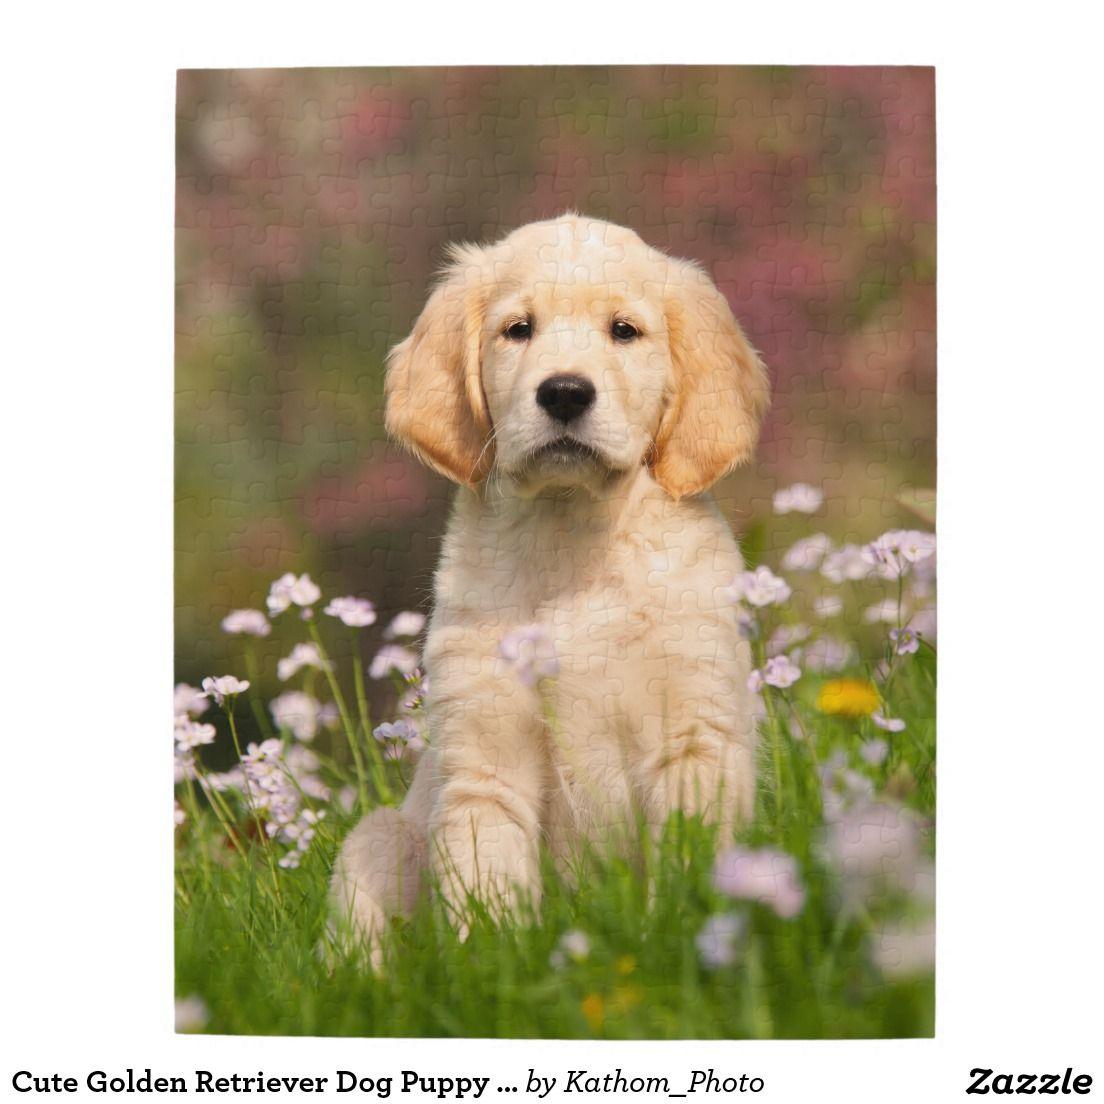 Cute Golden Retriever Dog Puppy Game 11x14 Jigsaw Puzzle Zazzle Com Dogs Golden Retriever Retriever Puppy Dogs Puppies